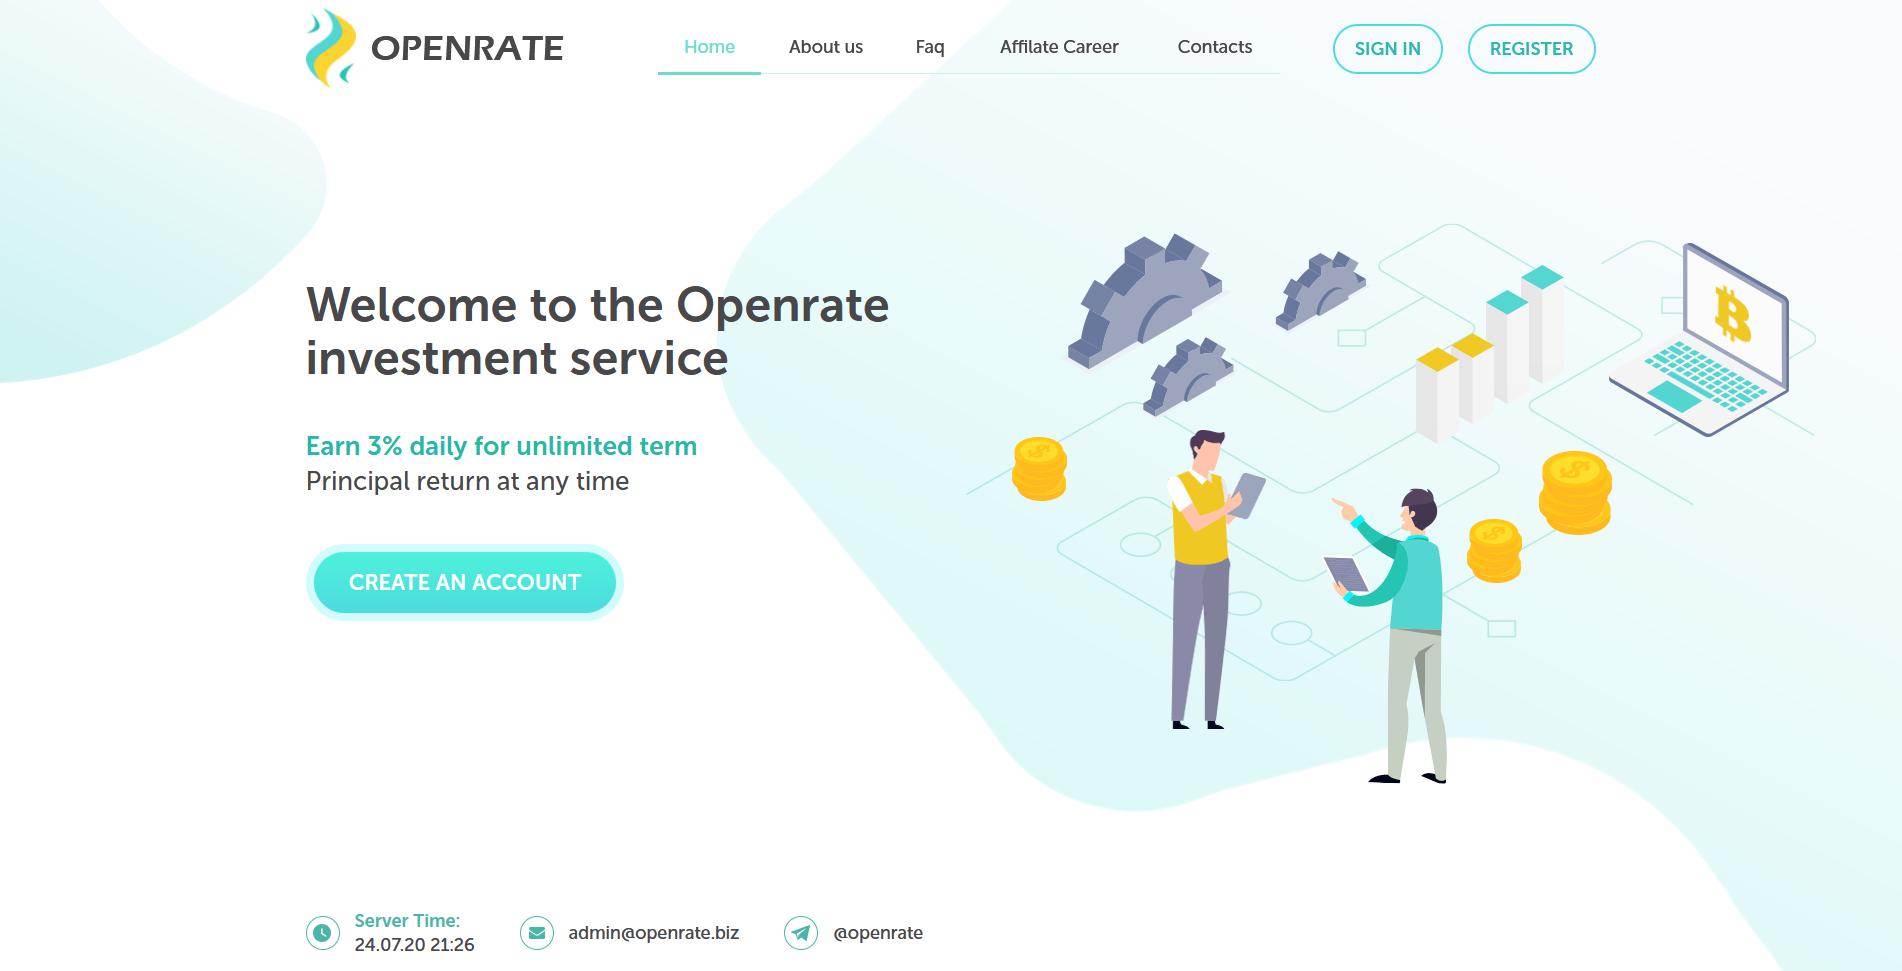 openrate - openrate.biz